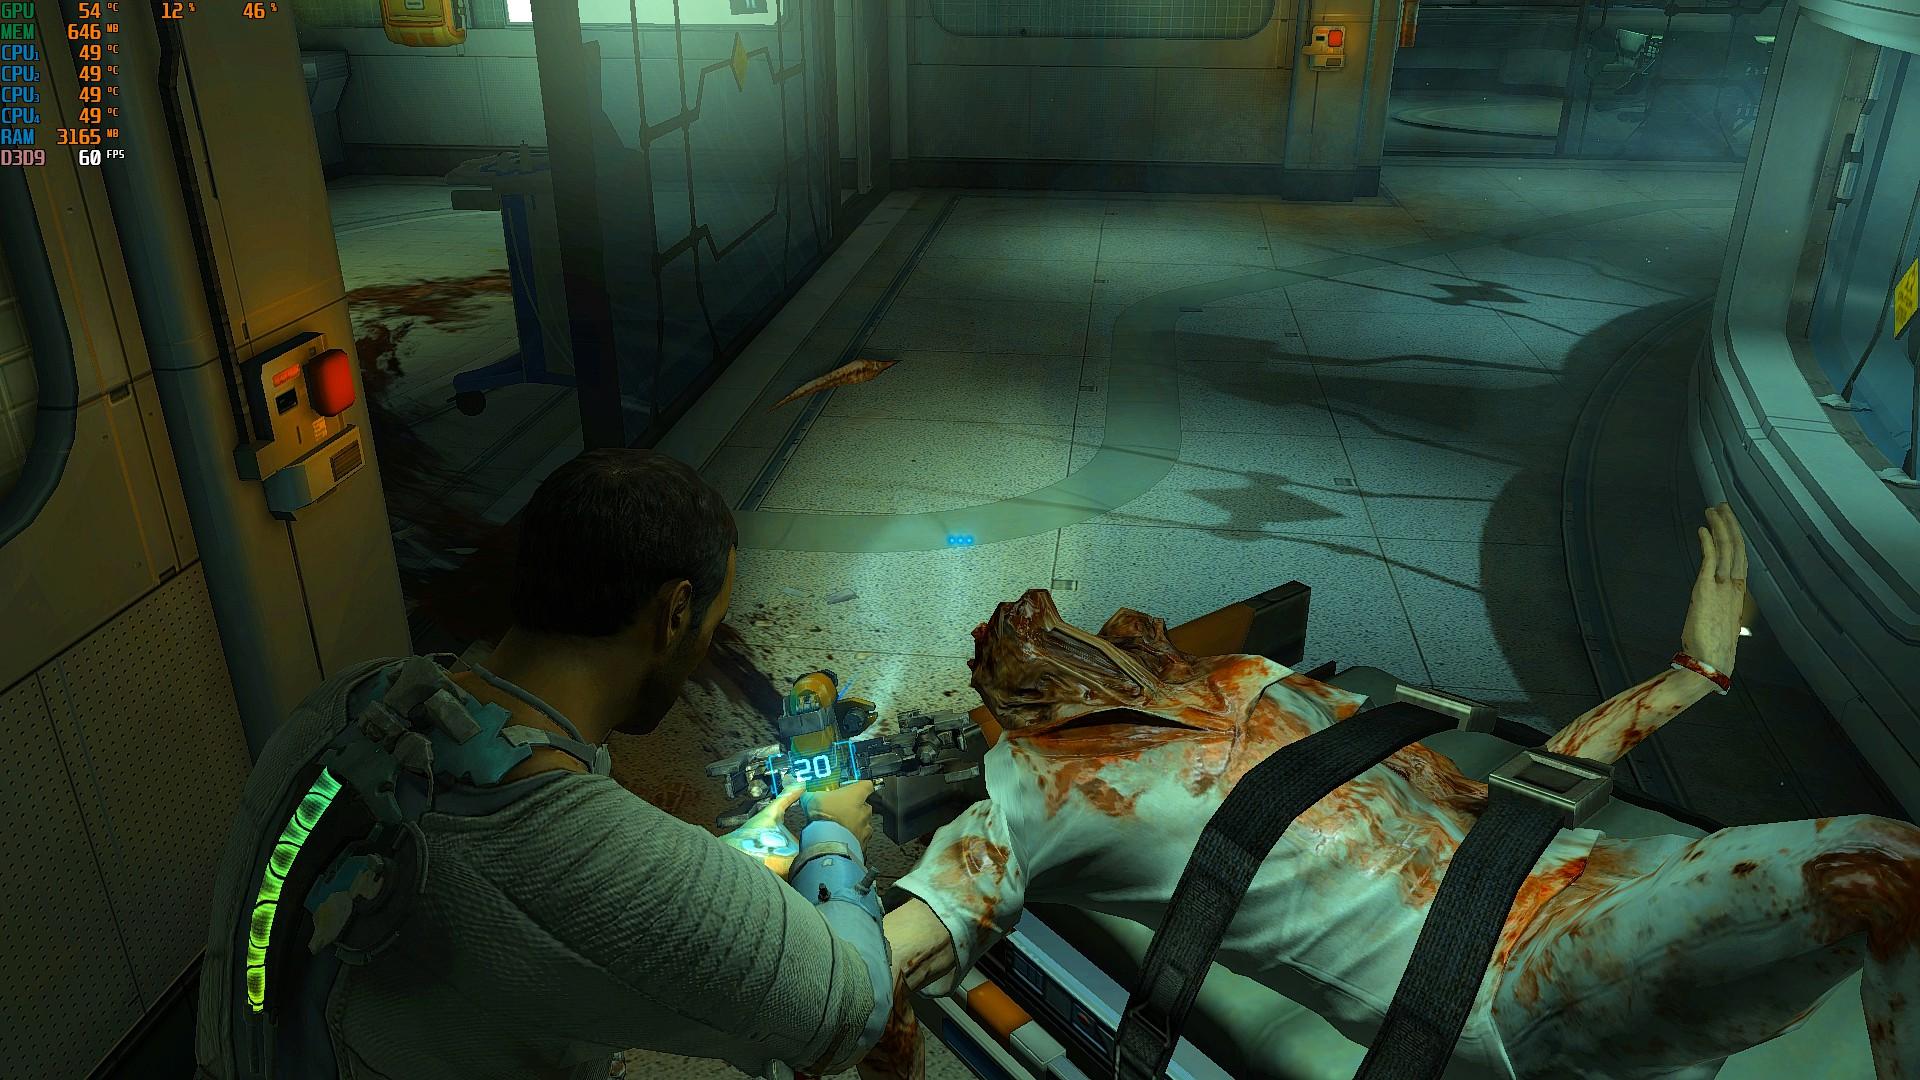 00033.Jpg - Dead Space 2